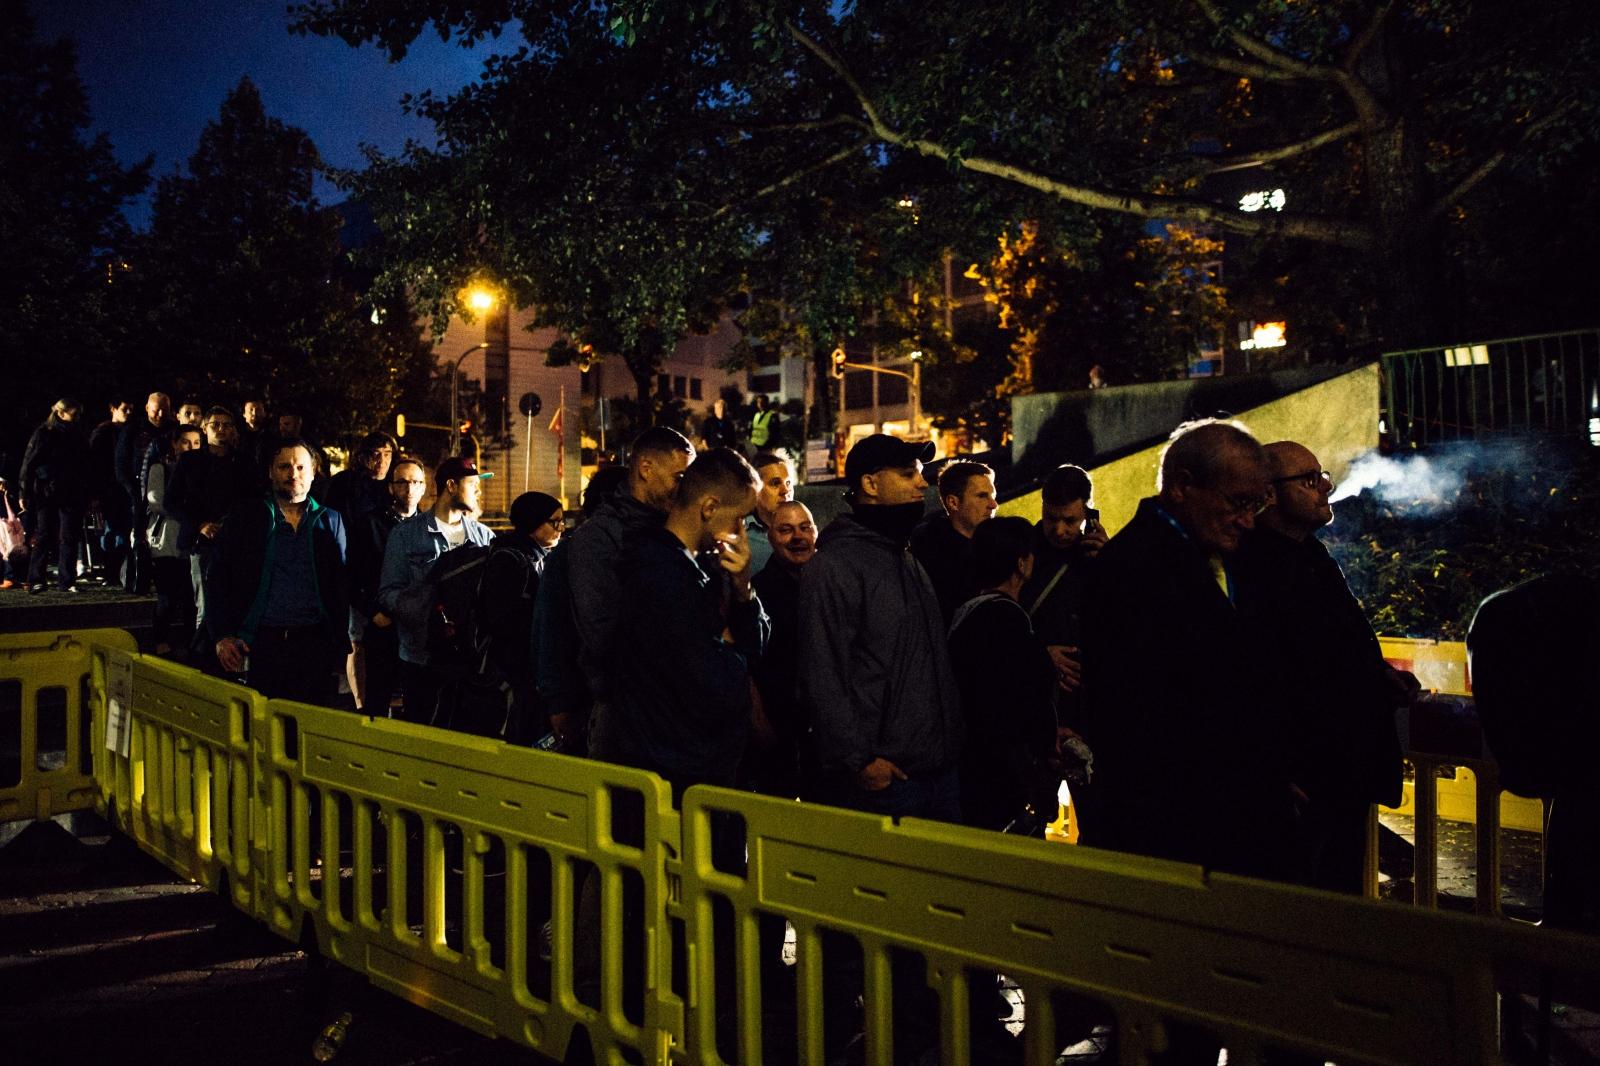 Neo-nazis standing in line.